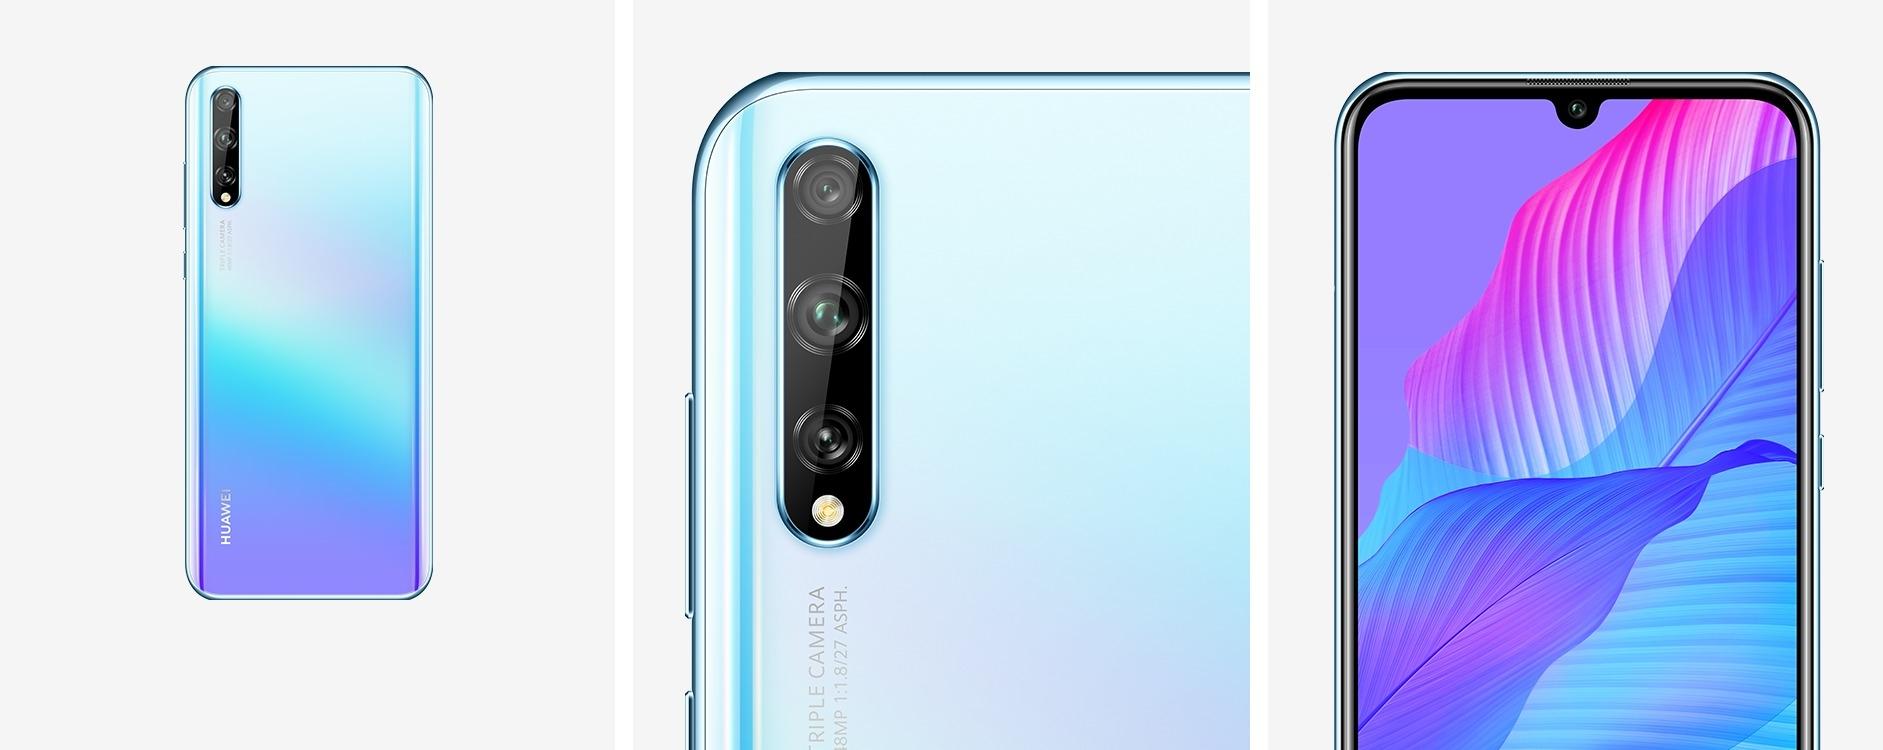 huawei y8p-colorful id phone